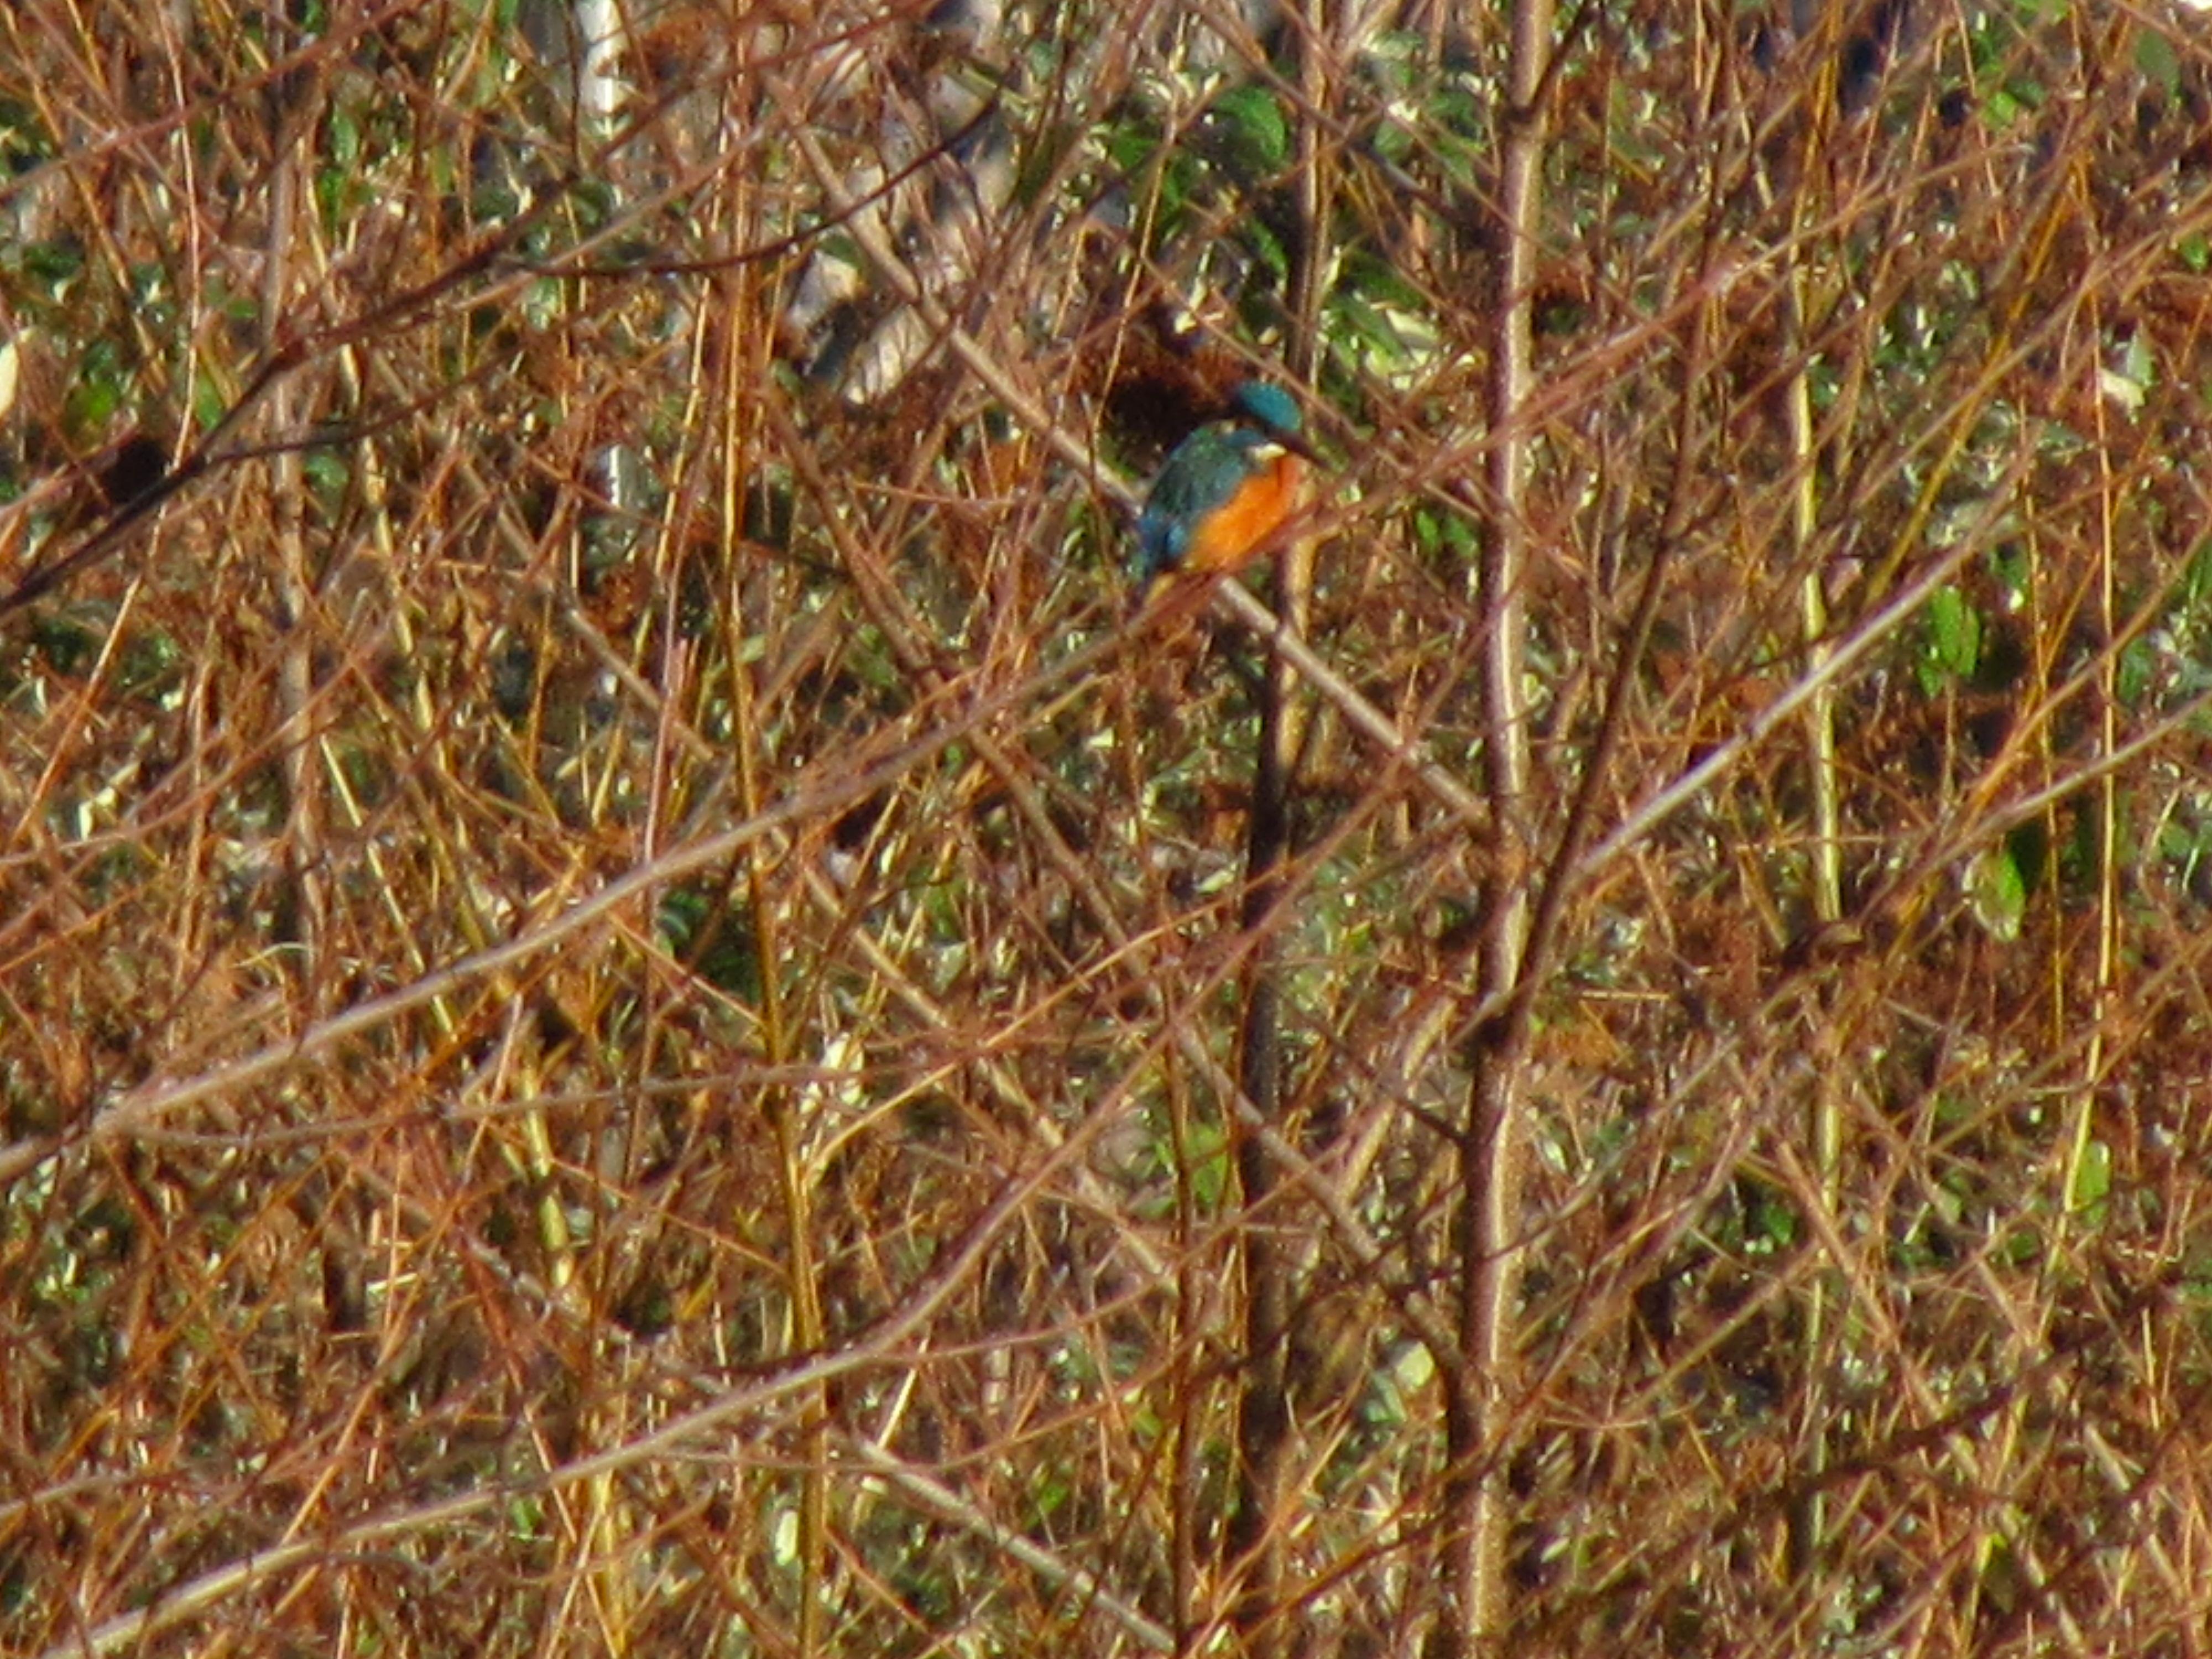 Kingfisher Clydach 29.12 (4)